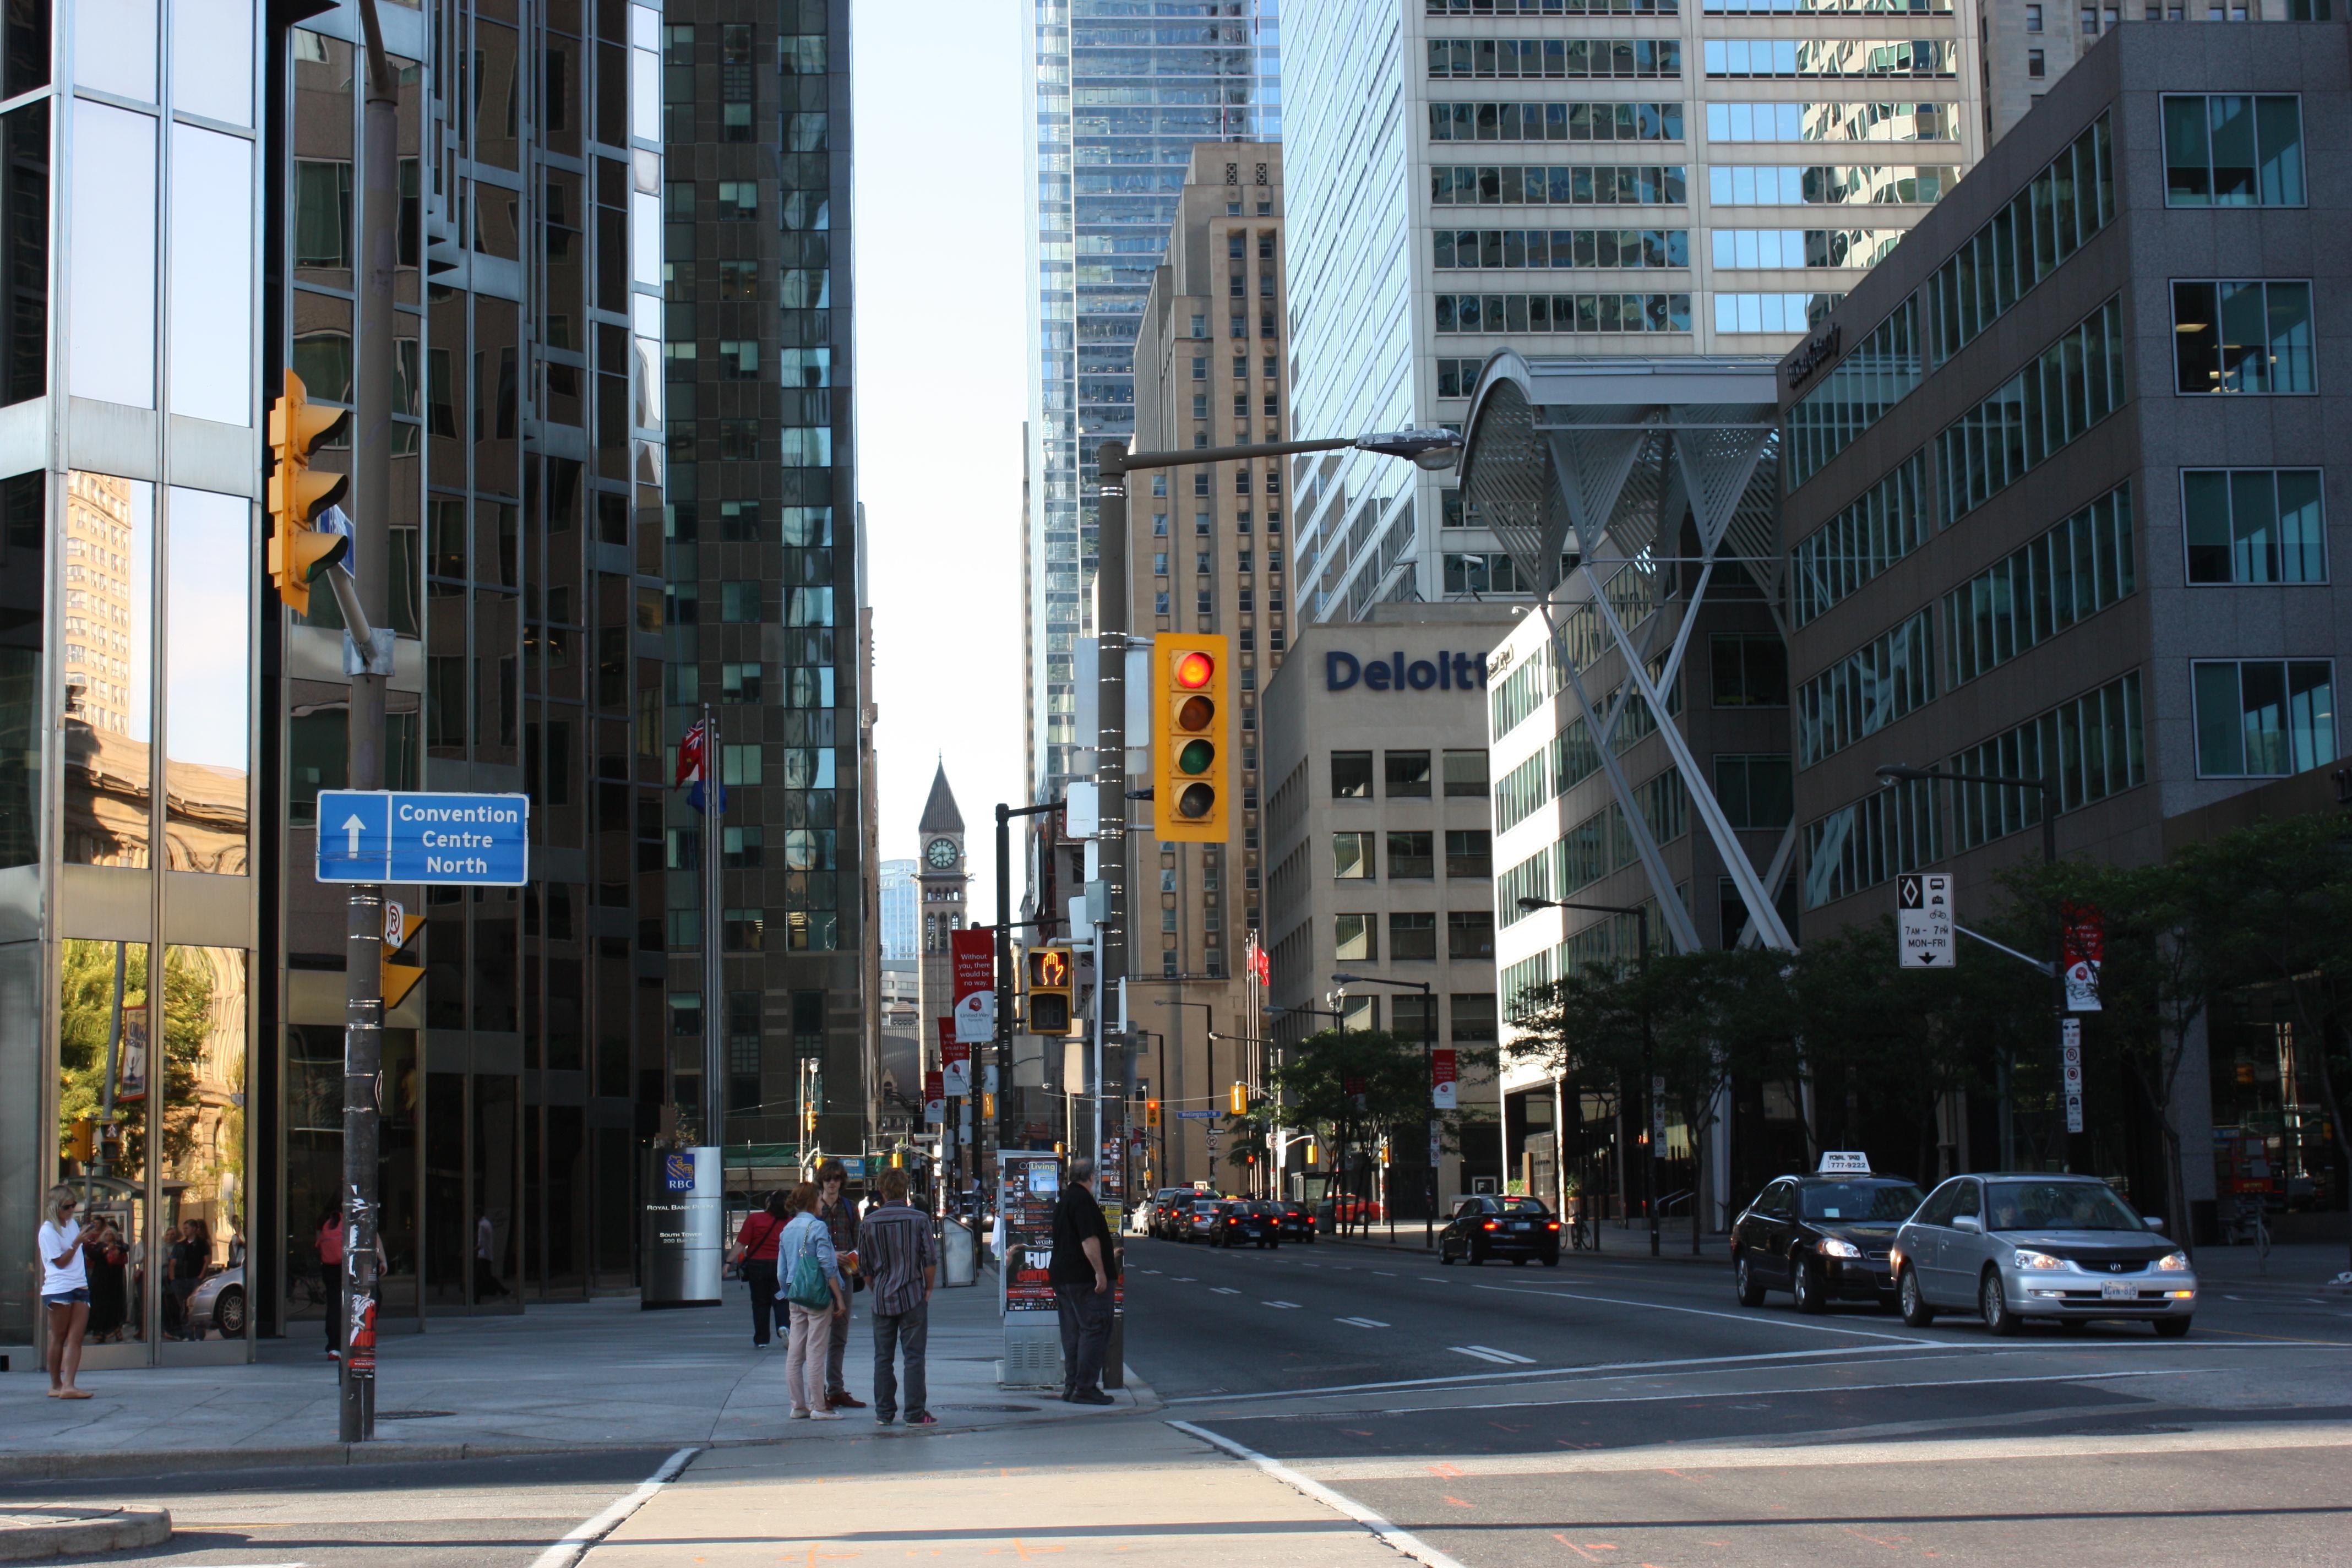 rencontre craigslist Toronto